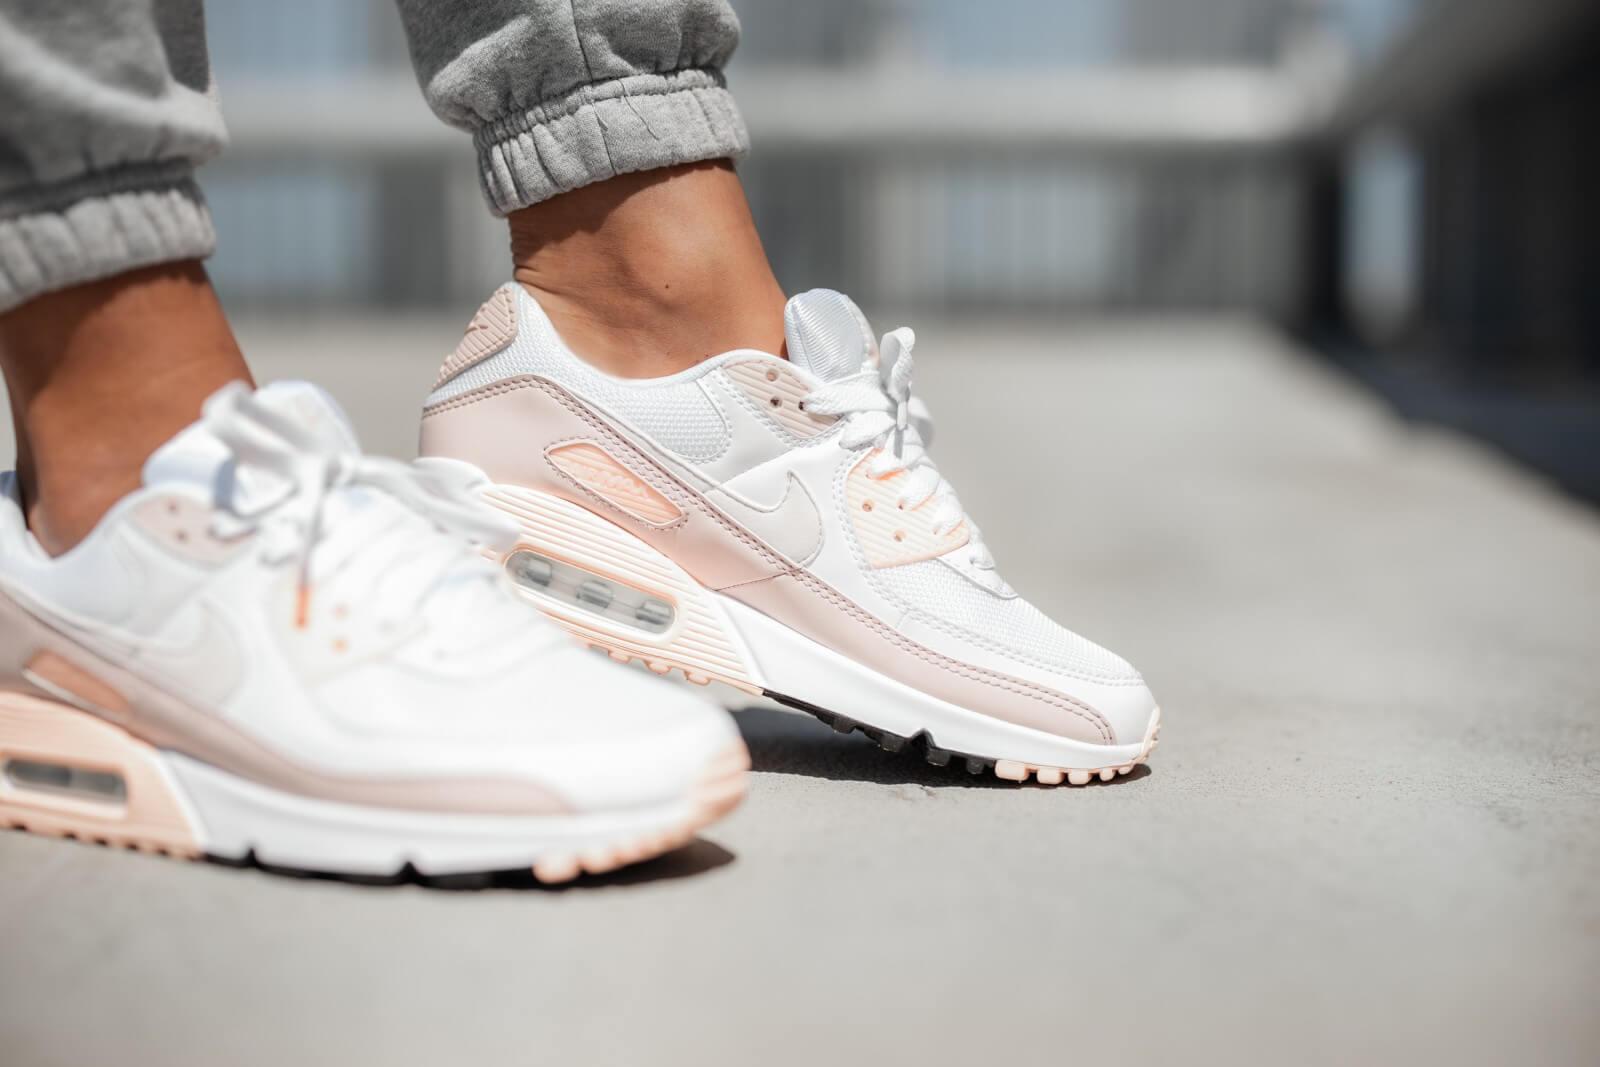 Nike Women's Air Max 90 White/Platinum Tint-Barely Rose